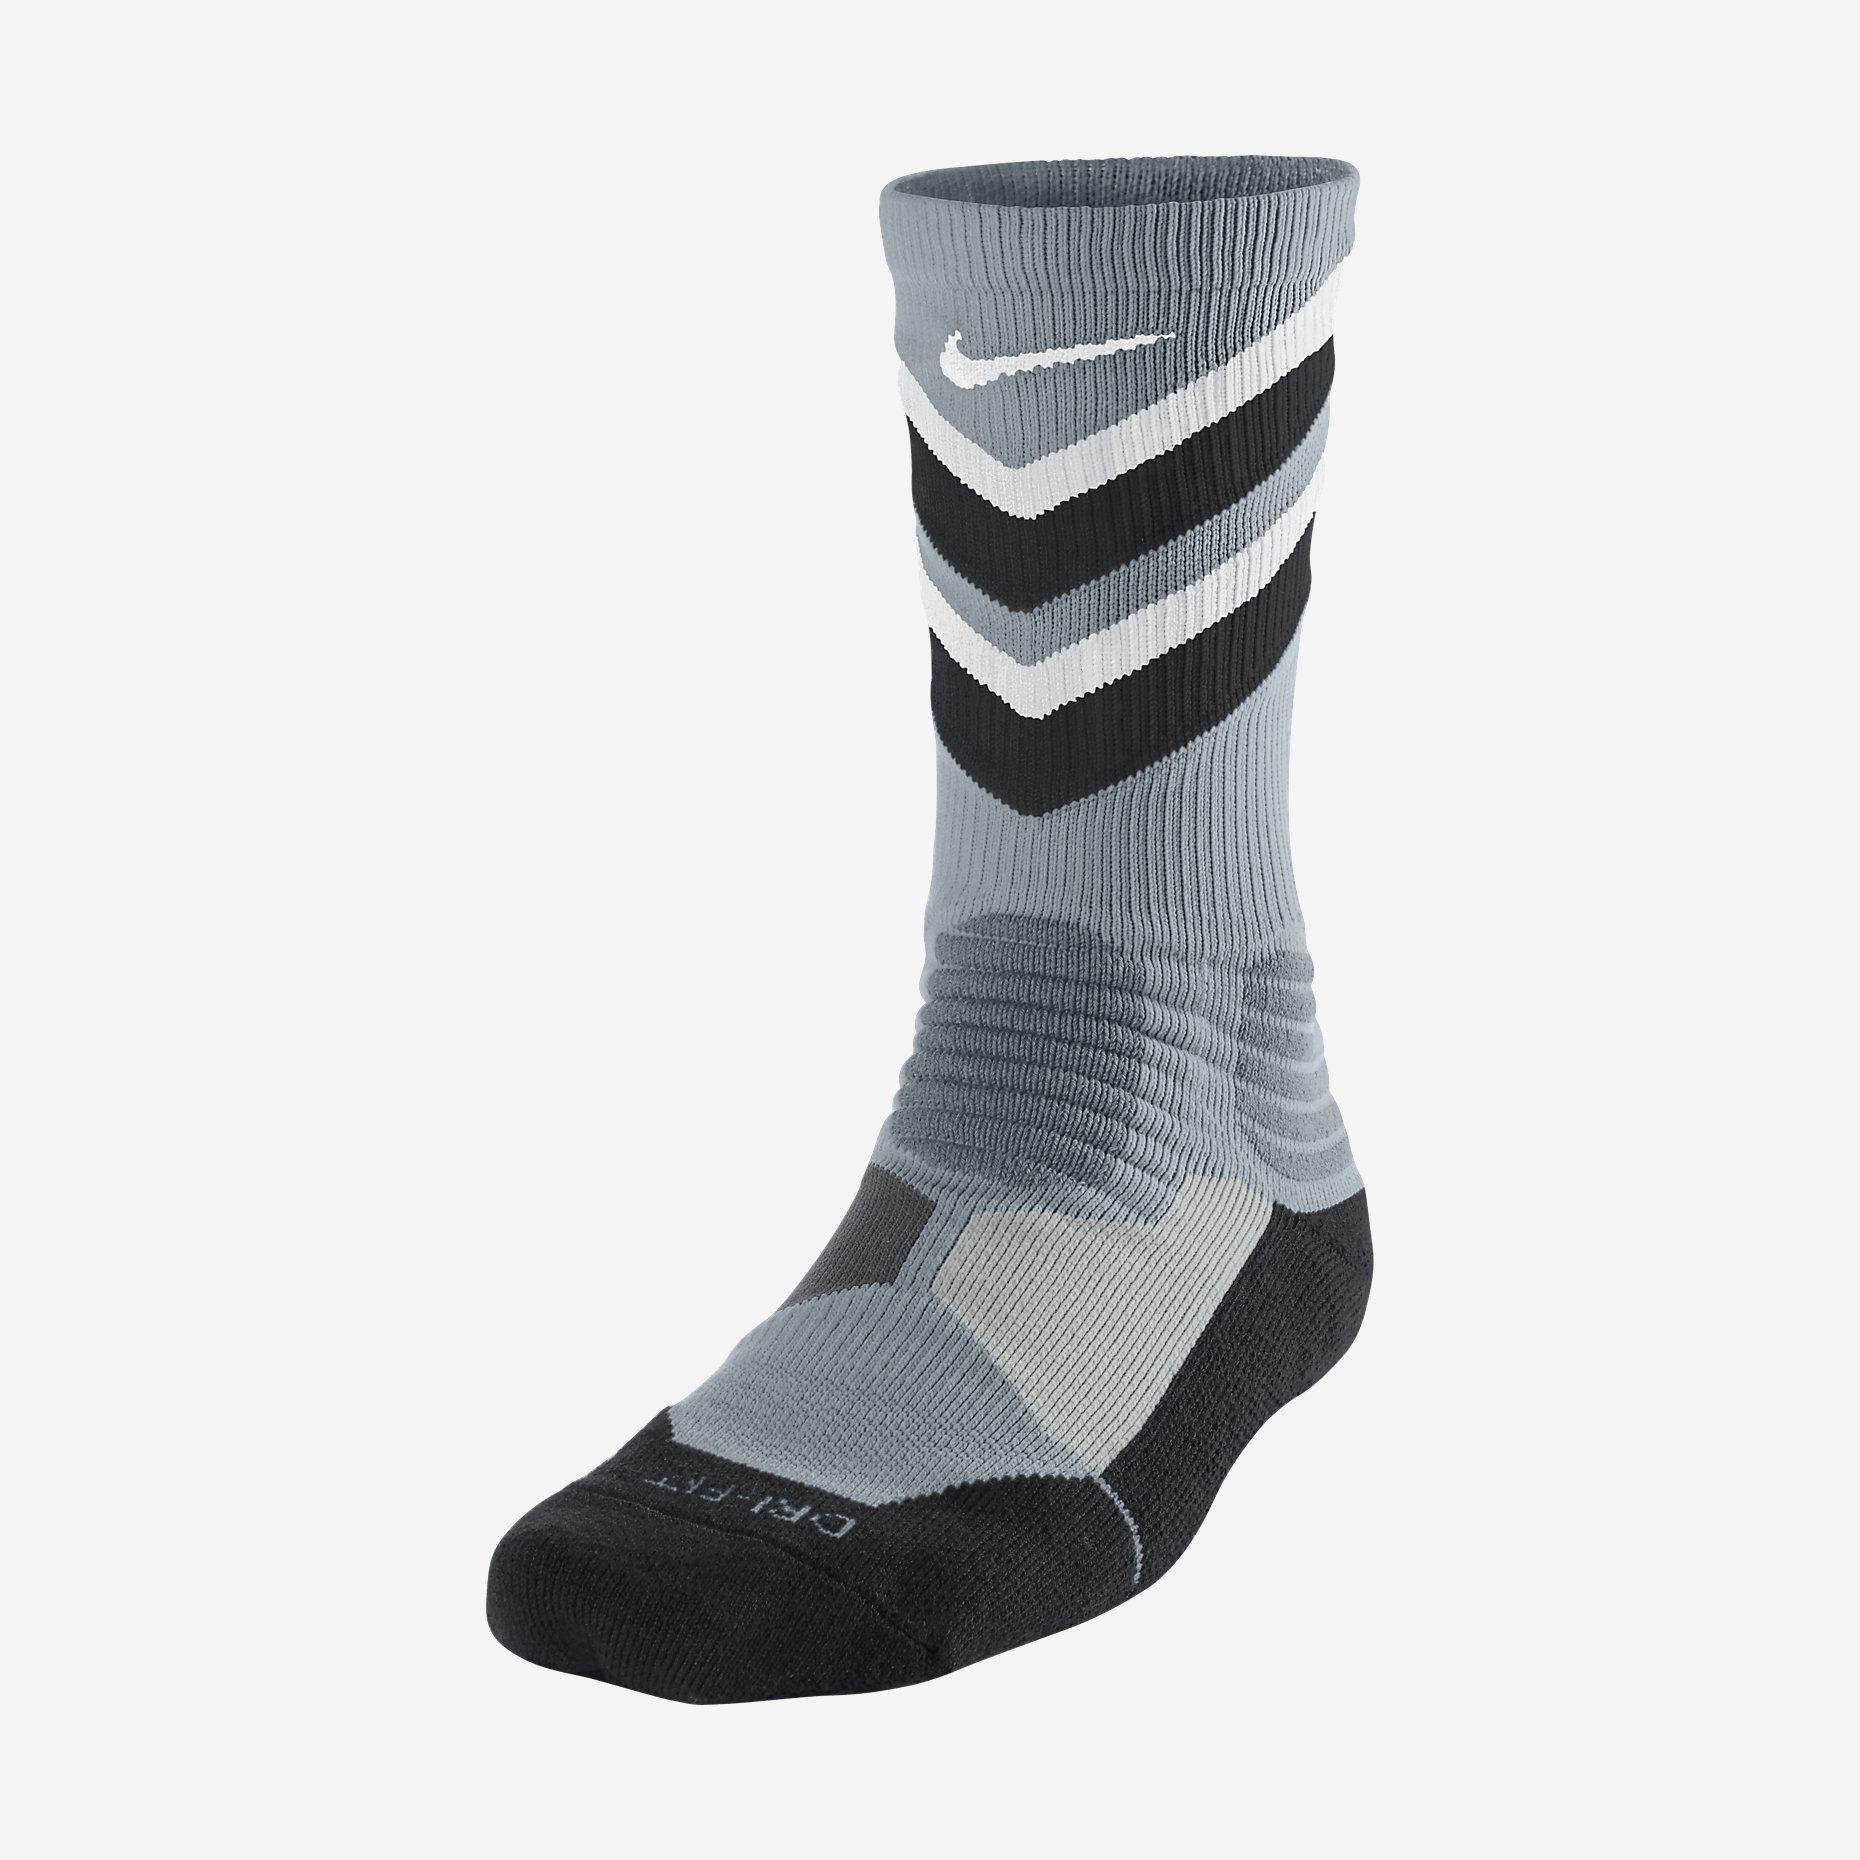 9eabbd3f3824 Nike Hyper Elite Chase Crew Basketball Socks. Nike Store